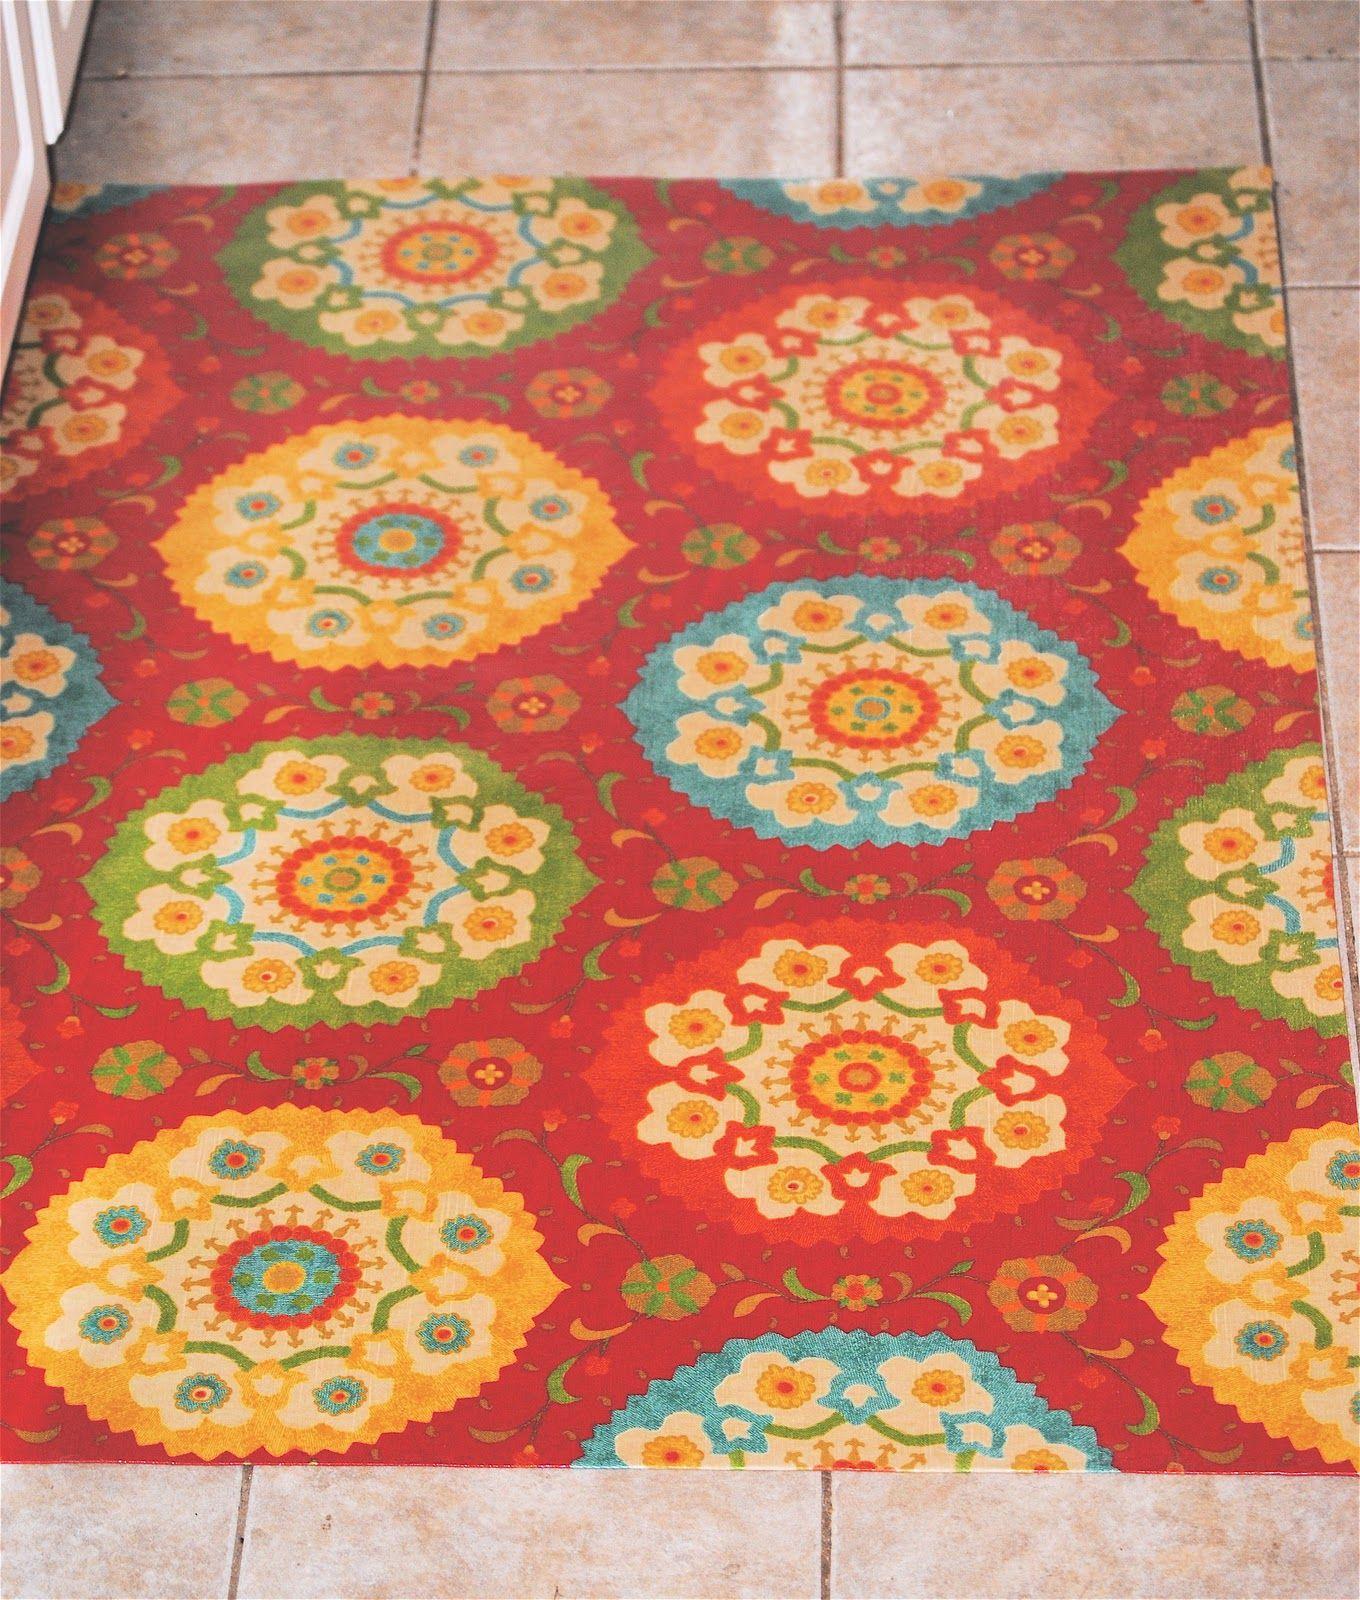 Diy kitchen rug diy rug vinyl rug floor cloth